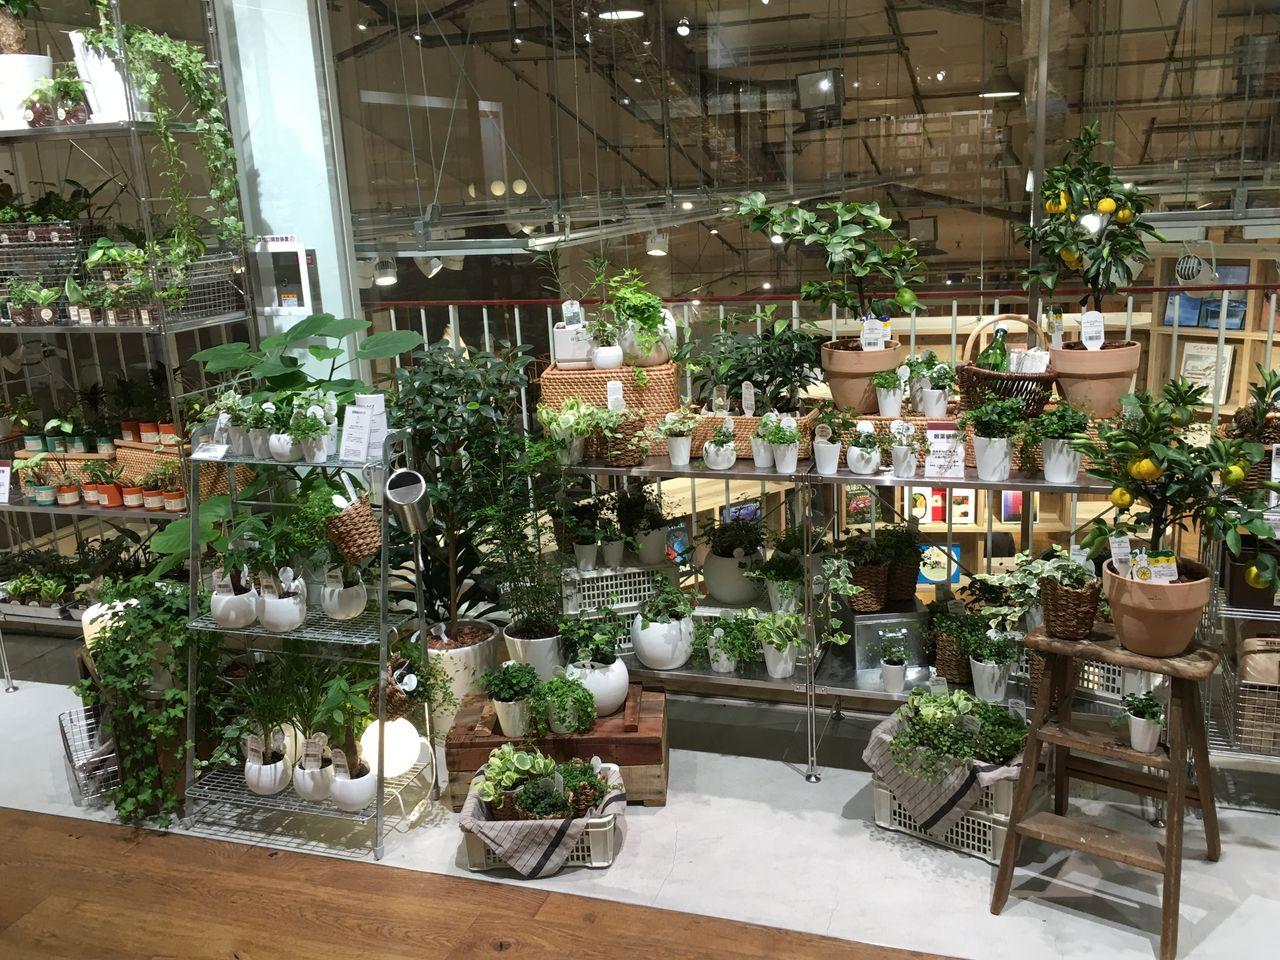 postさんの、部屋全体,観葉植物,無印良品,照明,雑貨